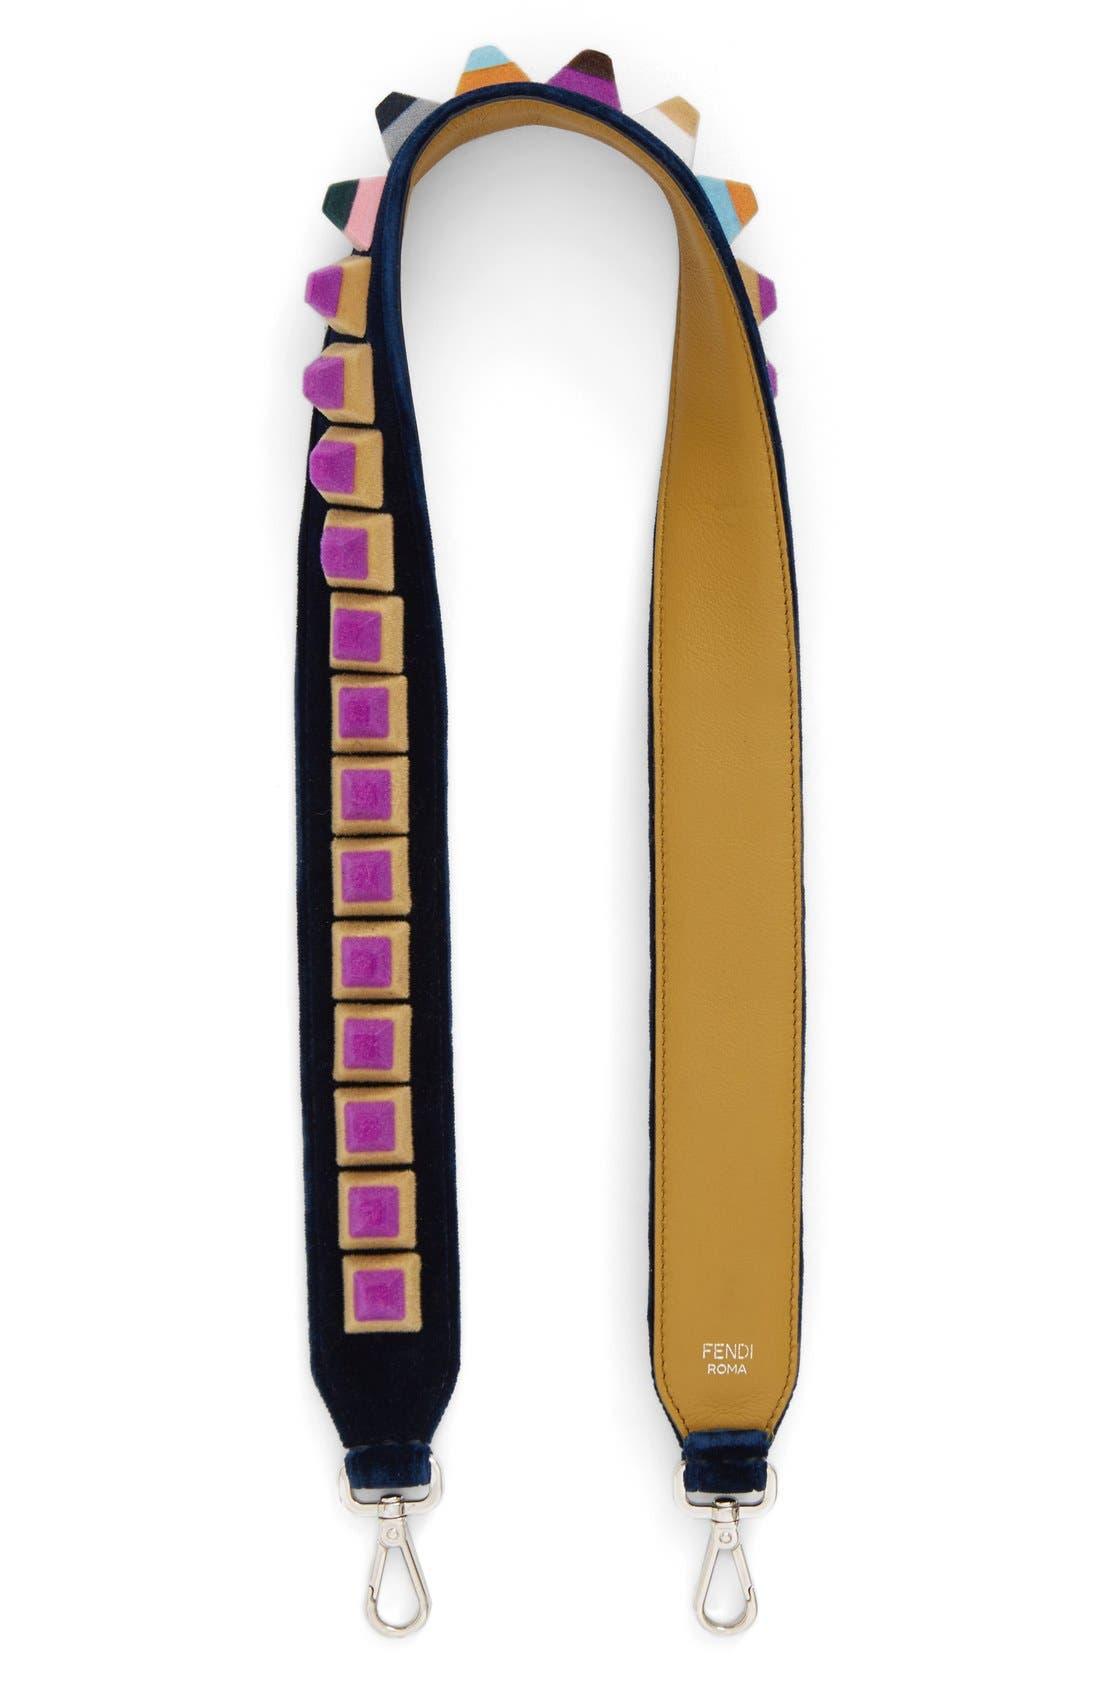 Studded Velvet Guitar Bag Strap,                         Main,                         color, NAVY BLUE/ MUSTARD/ MULTICOLOR